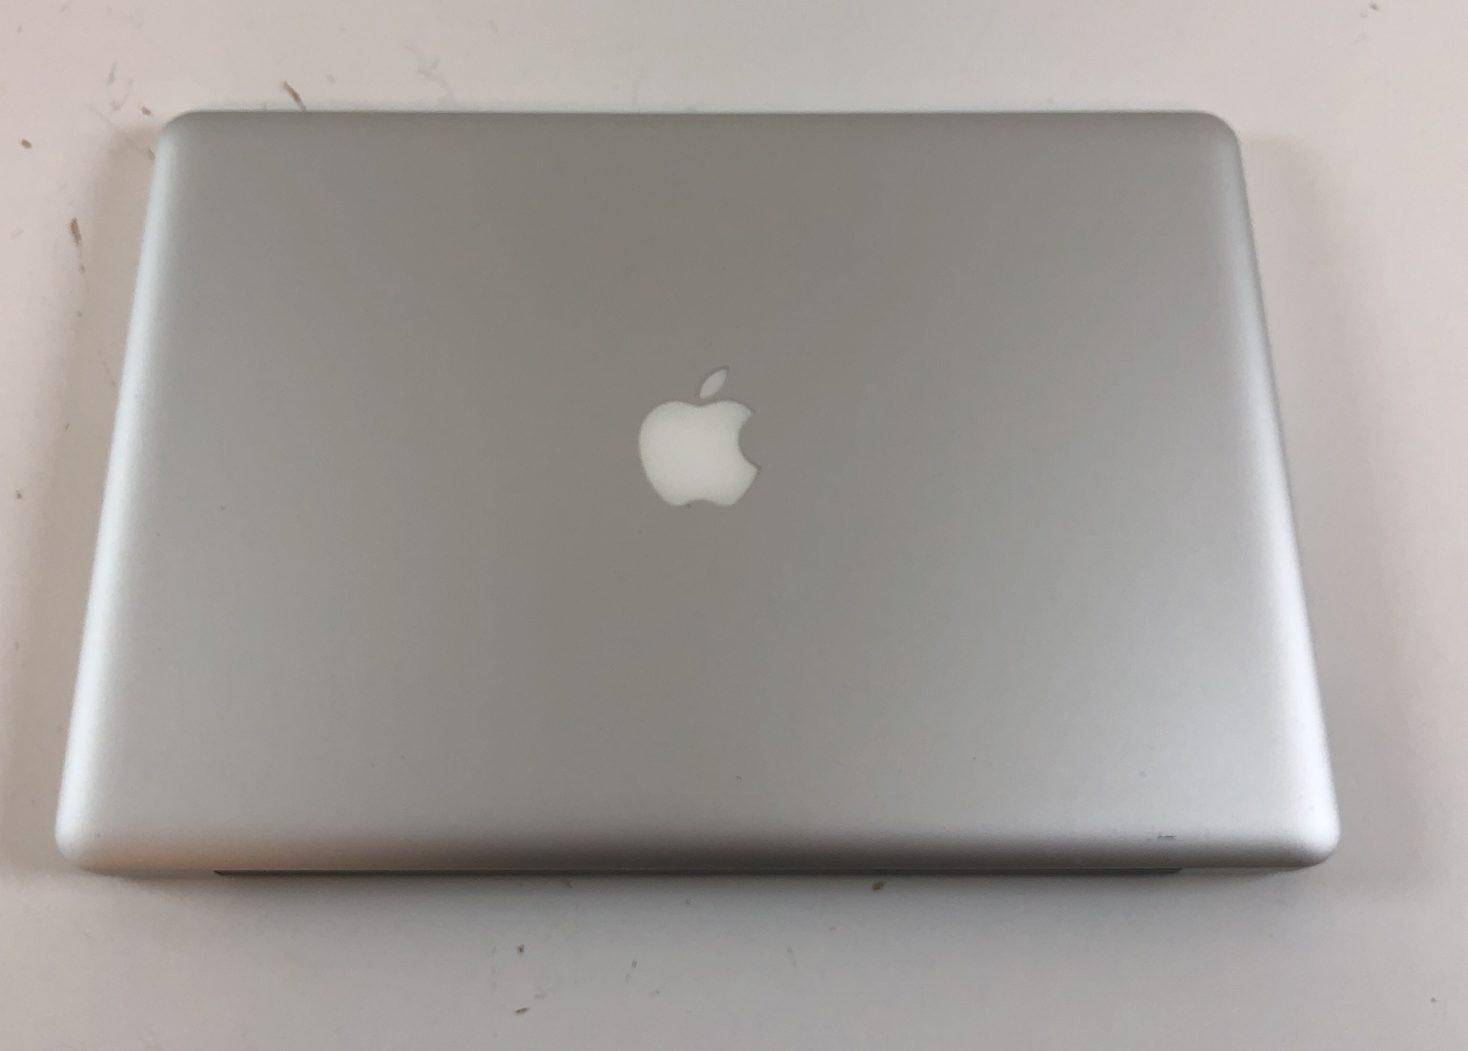 "MacBook Pro 15"" Mid 2012 (Intel Quad-Core i7 2.3 GHz 8 GB RAM 256 GB SSD), Intel Quad-Core i7 2.3 GHz, 8 GB RAM, 256 GB SSD, bild 2"